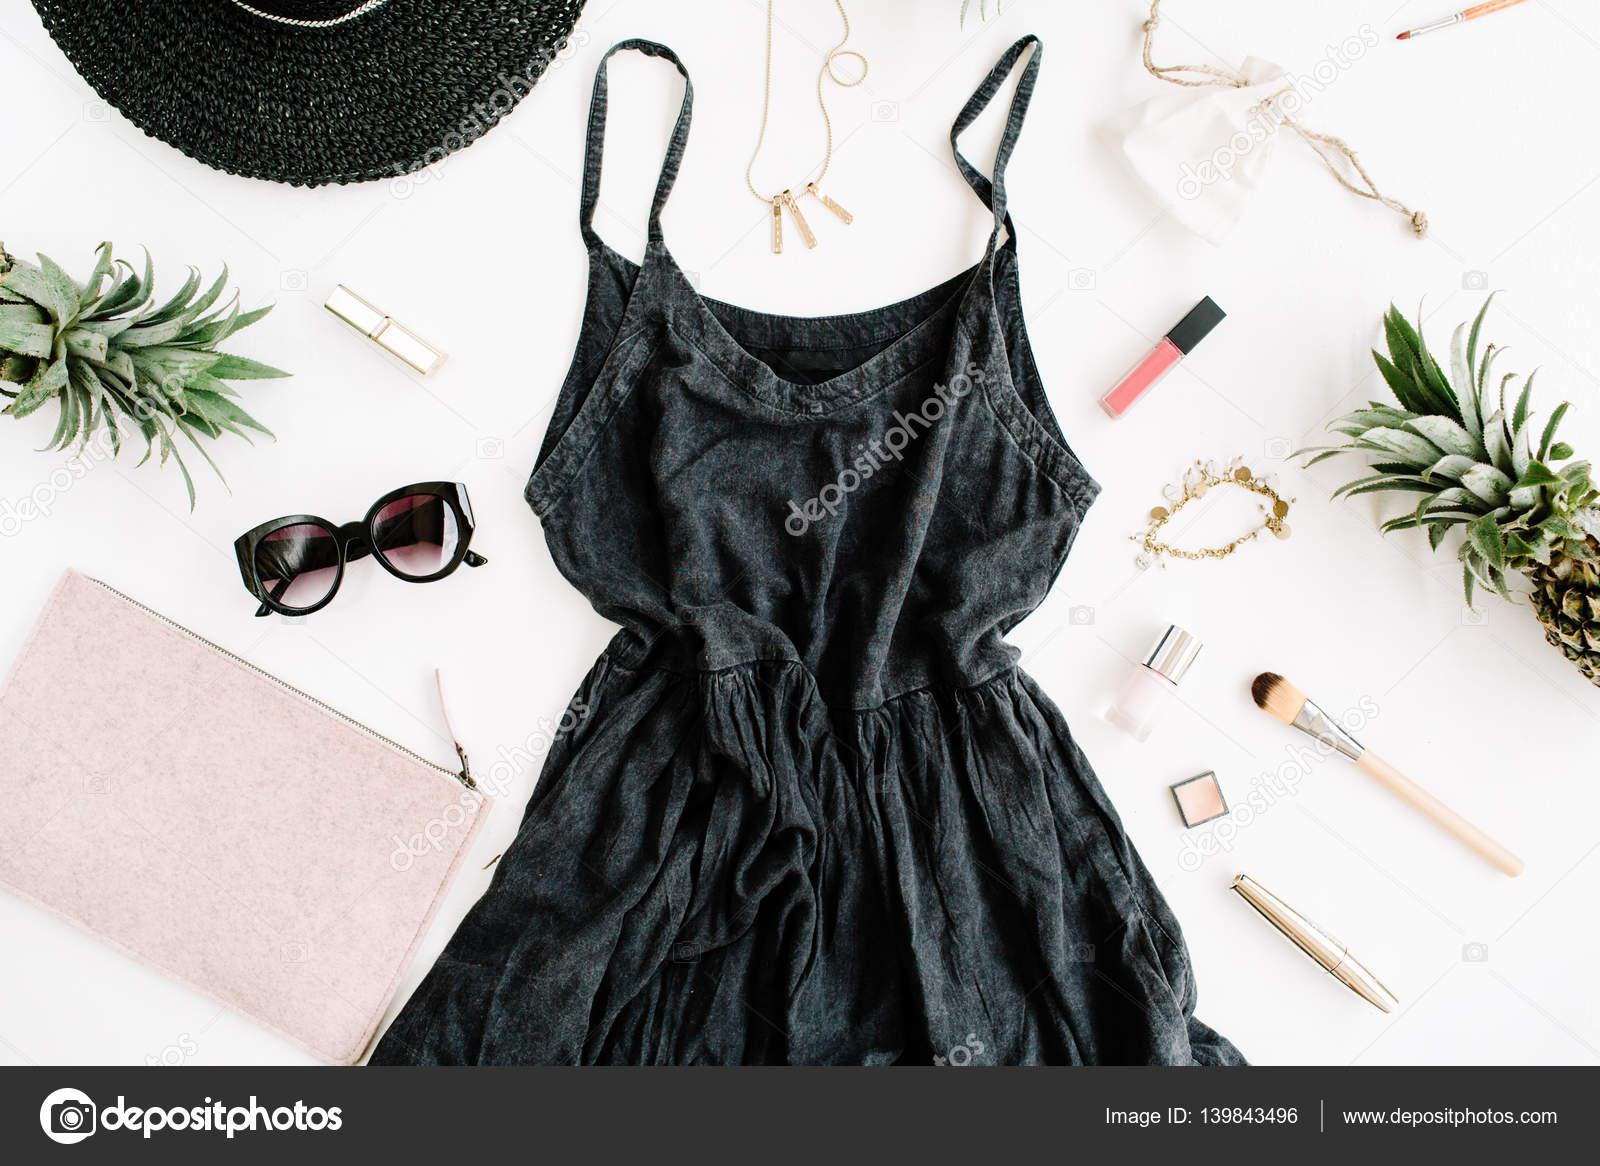 1741481d16ea Μοντέρνα γυναικεία ρούχα — Φωτογραφία Αρχείου · Καλοκαίρι casual στυλ.  Σύγχρονη γυναίκα κολάζ ρούχα και αξεσουάρ. Φόρεμα